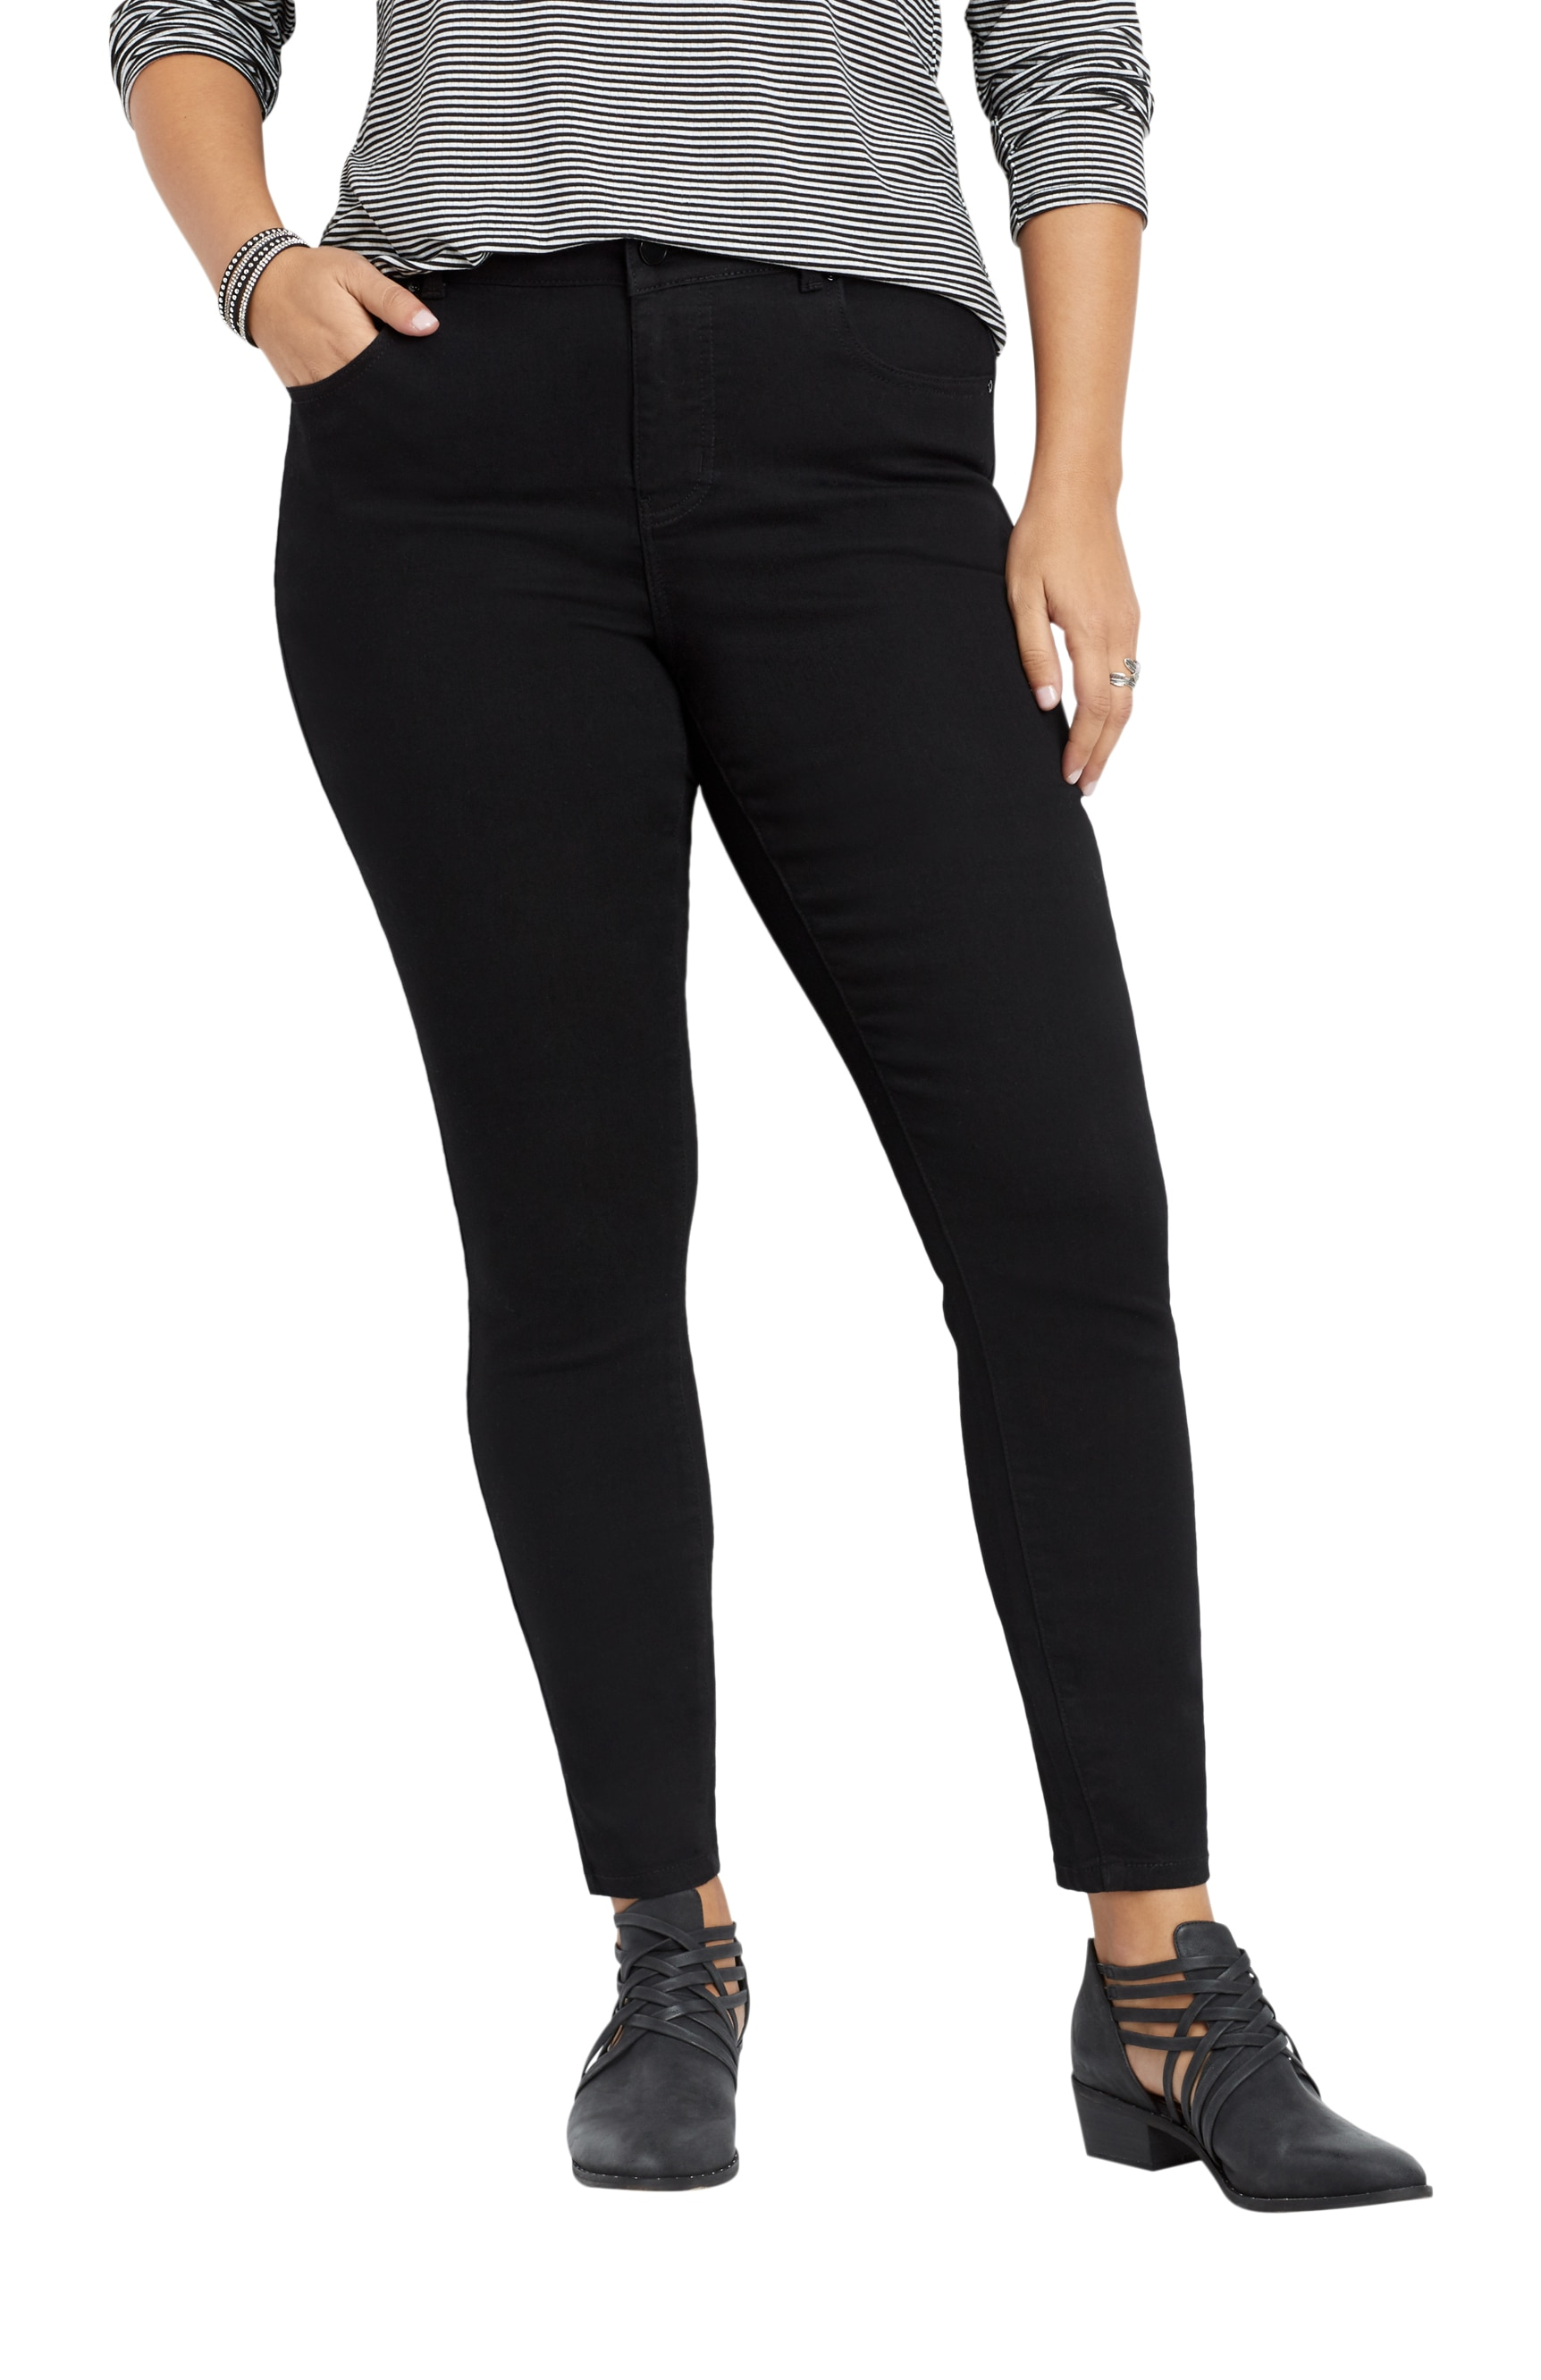 f713fd7755066 Maurices High Rise Skinny Jean - Plus Size Everflex Women s Black Stretch